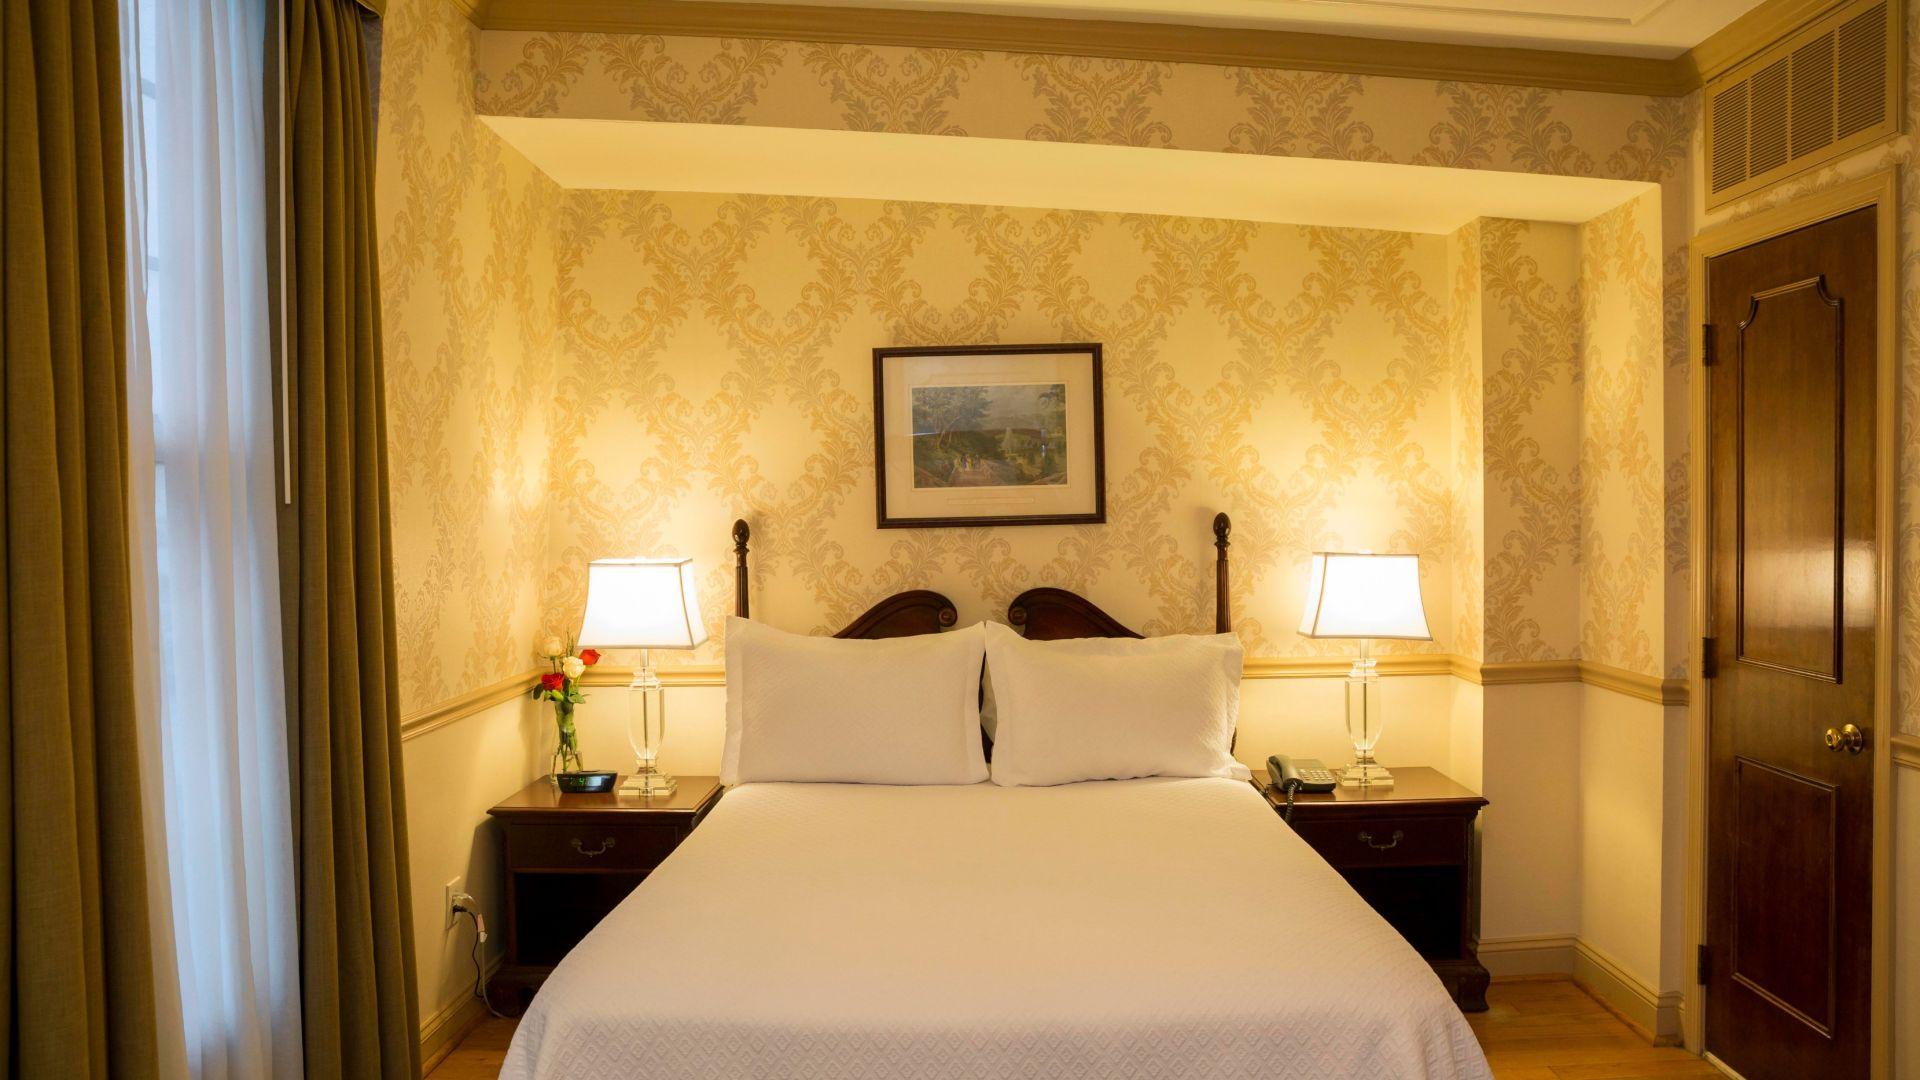 Hotels in Old City | Philadelphia | Penn\'s View Hotel